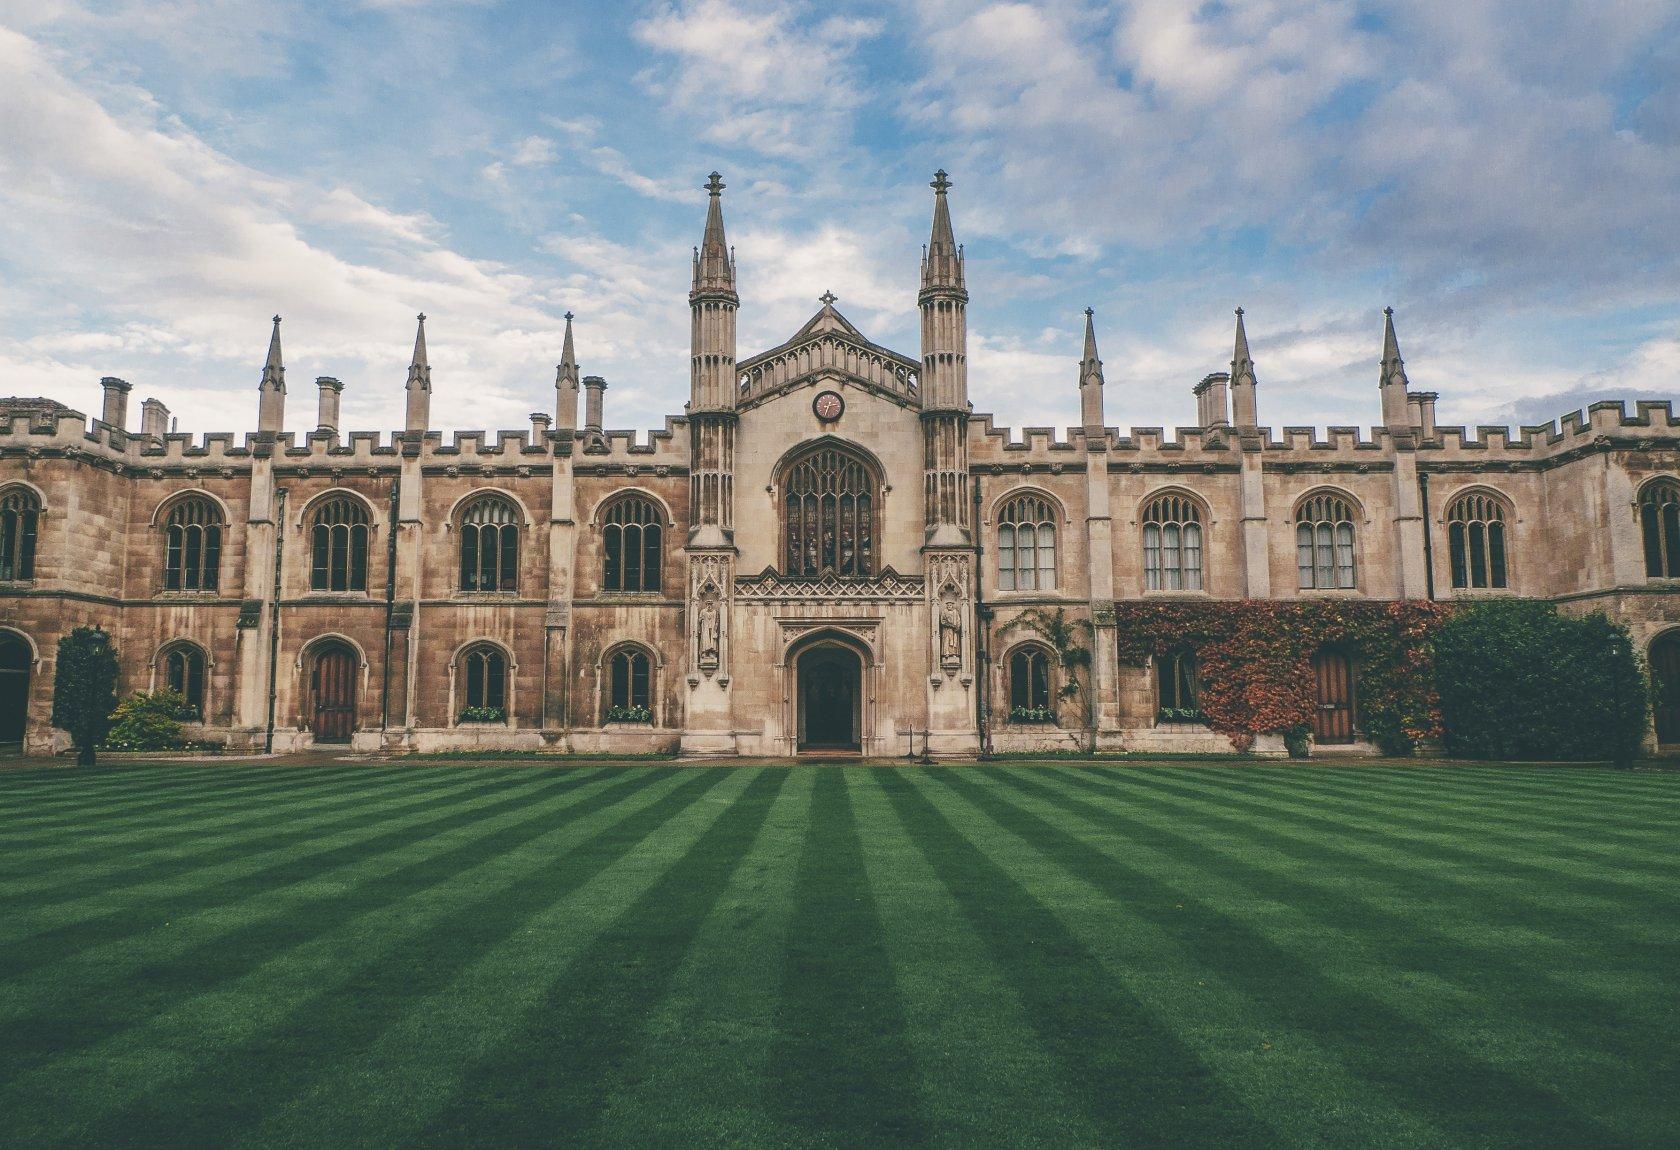 Top 5 Literary Destinations of England